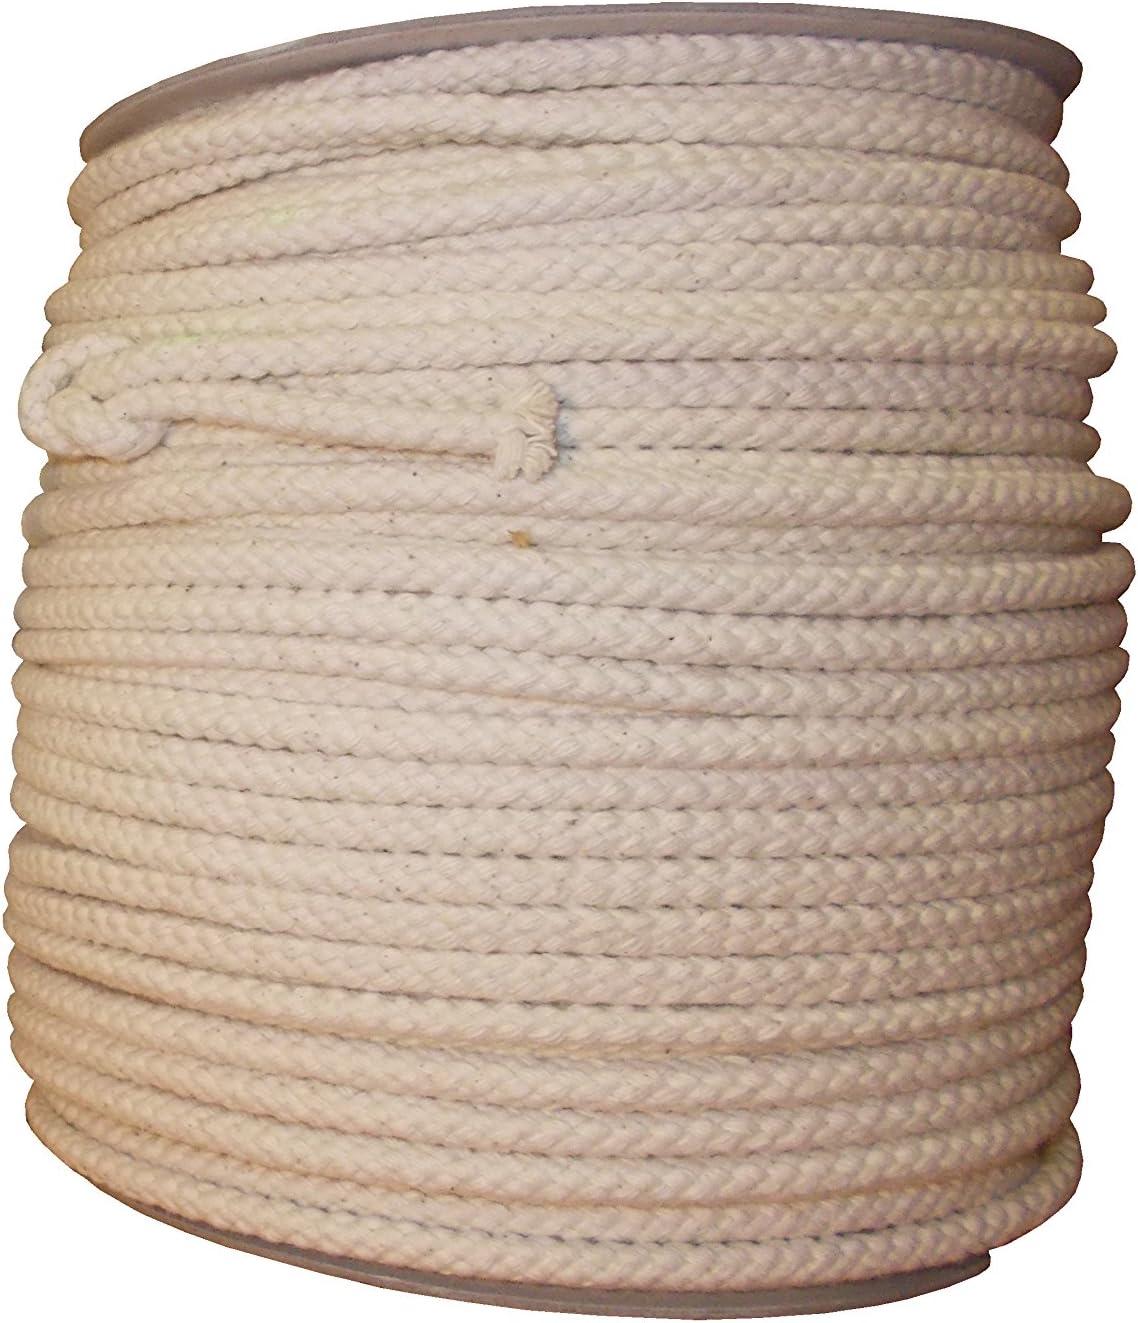 100/% naturel 8/Strand Corde en coton 6/mm 20/metres